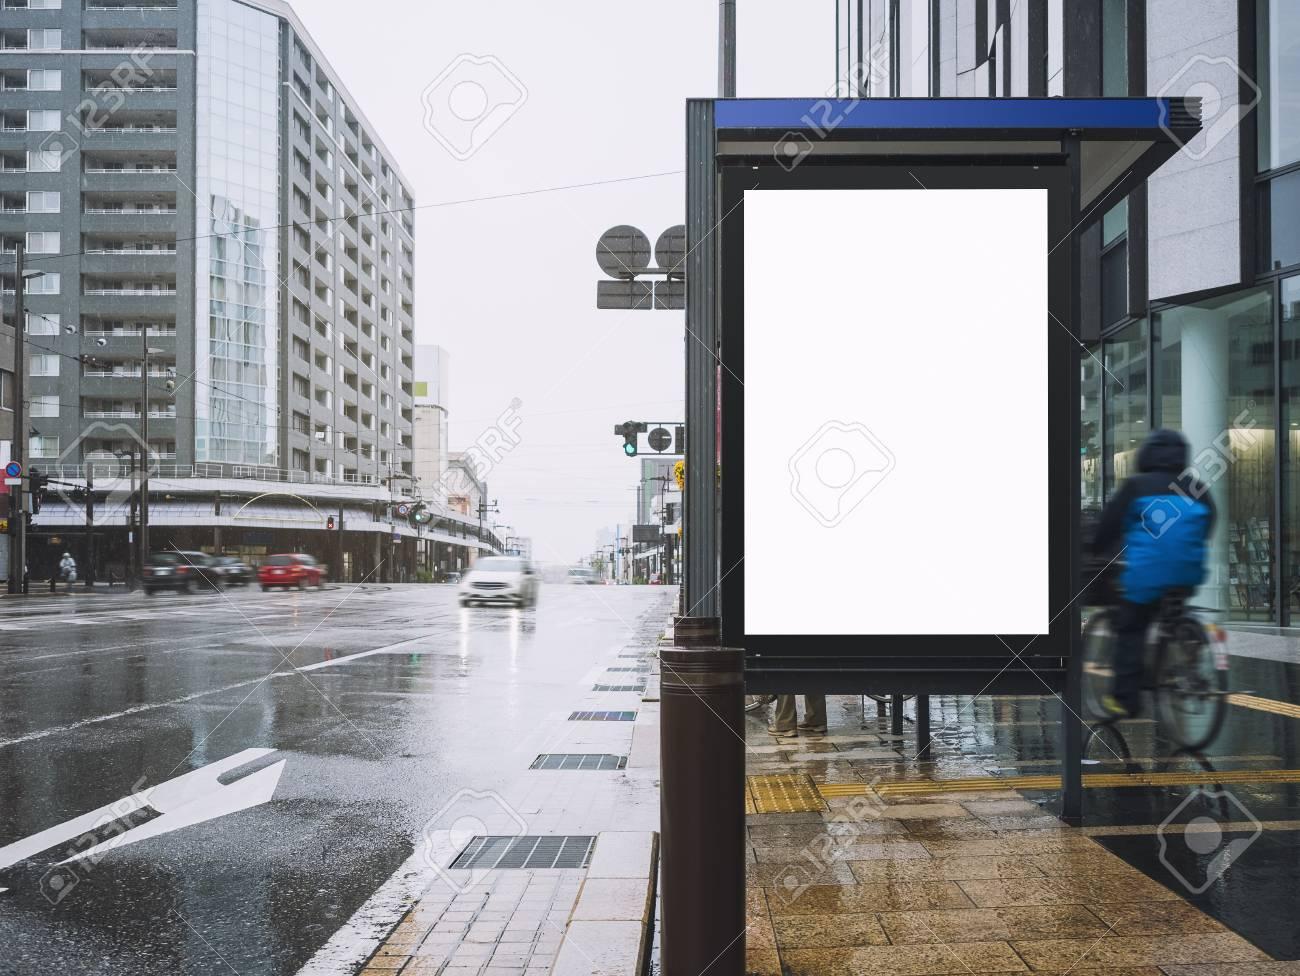 mock up banner template at bus shelter media outdoor street sign